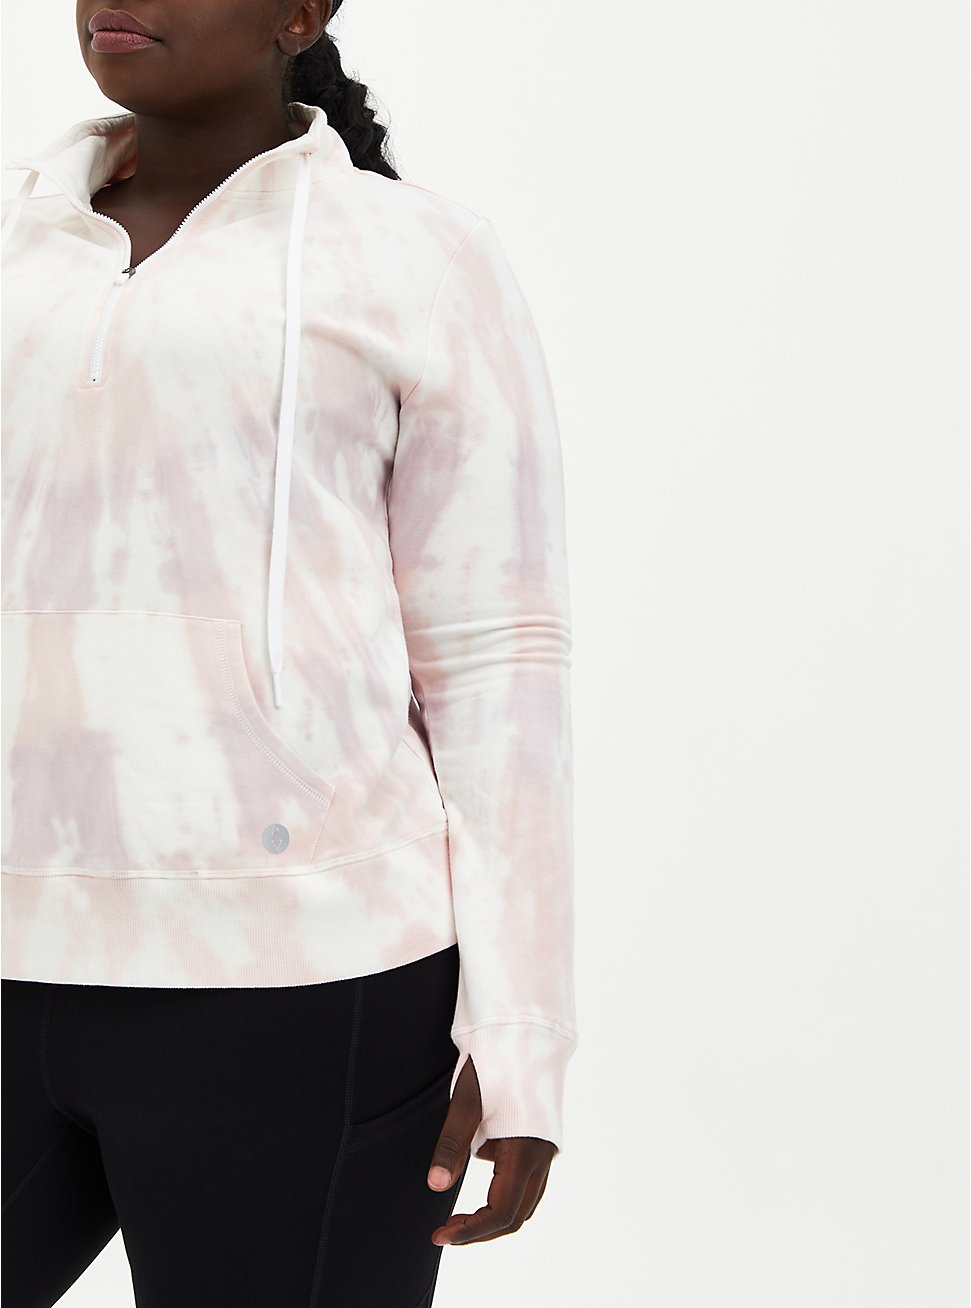 Plus Size Coral Tie-Dye Terry Active Half-Zip Pullover, TIE DYE, hi-res